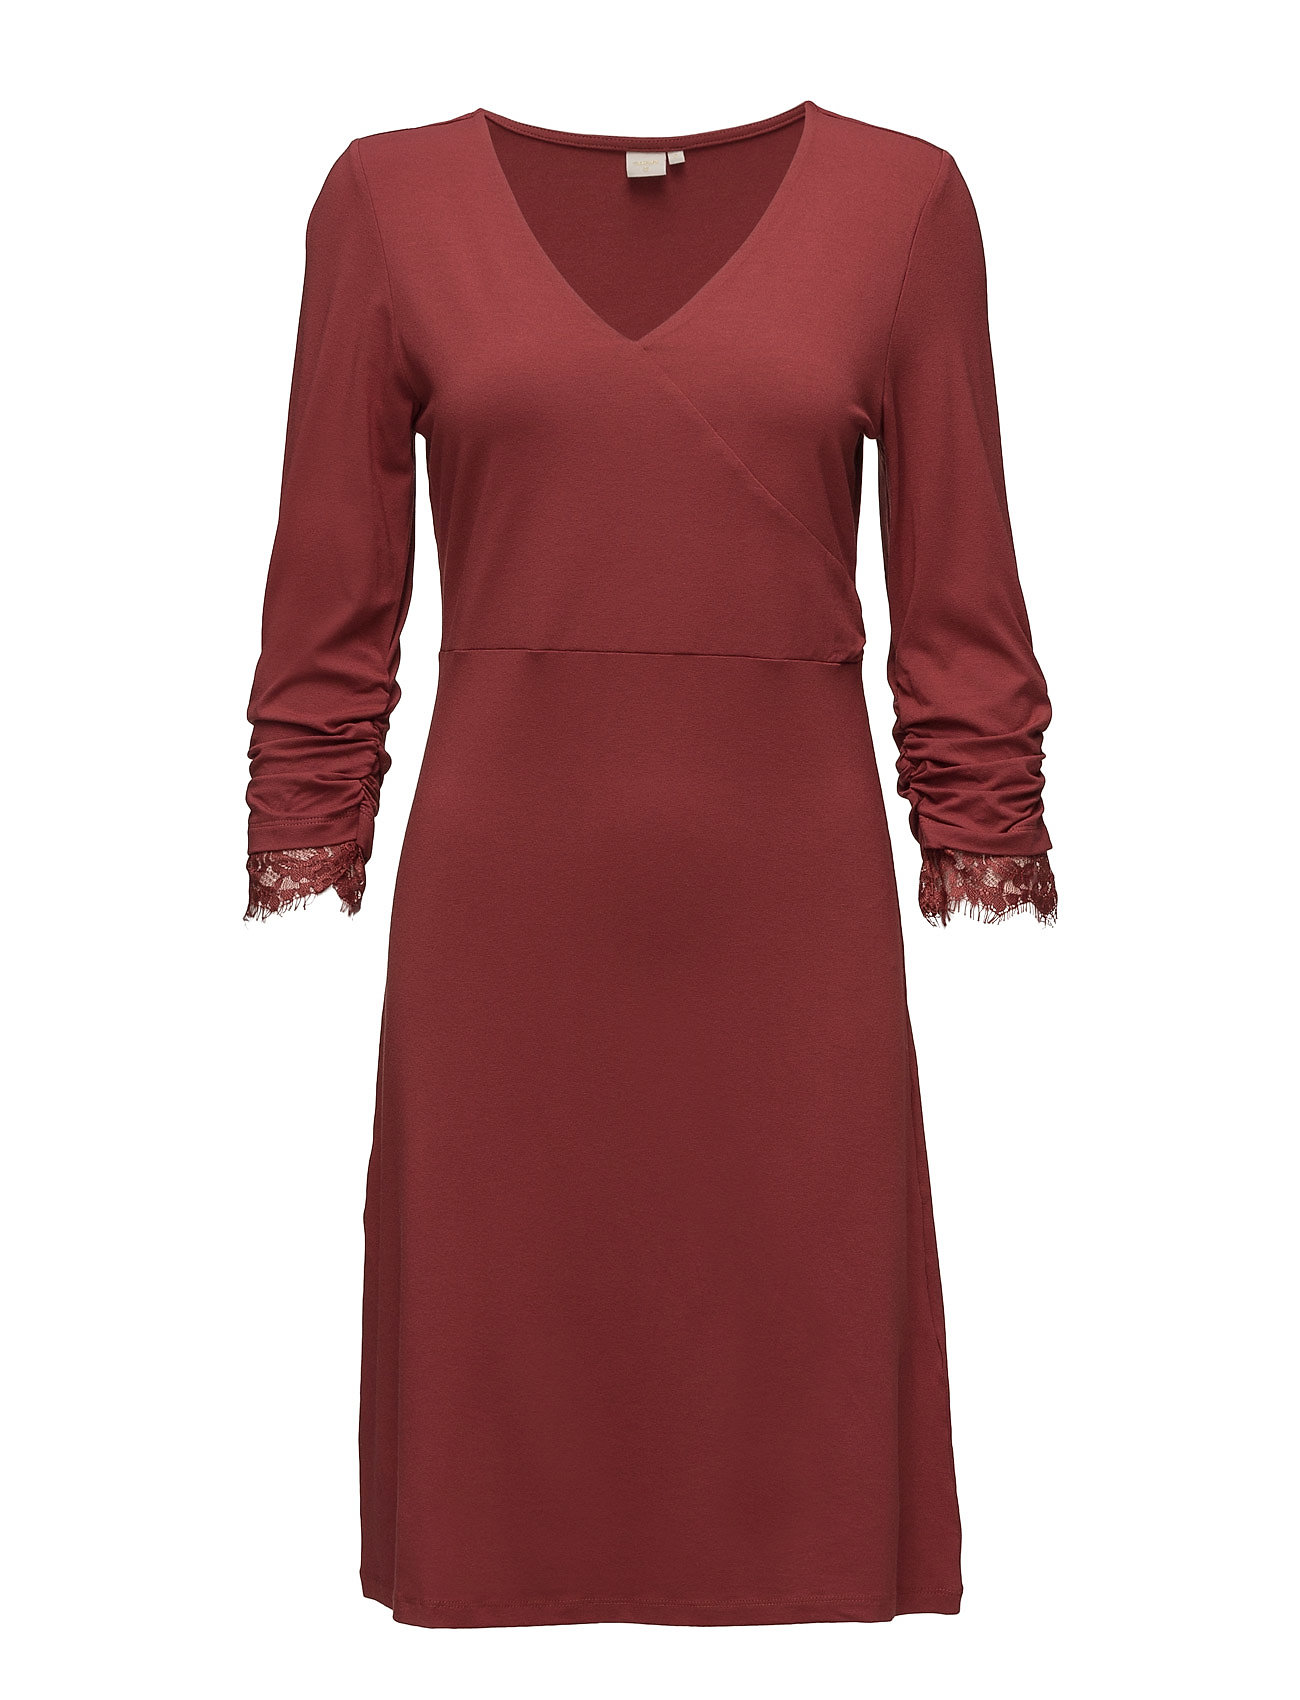 Rosemary Solid Dress Cream Dresses thumbnail